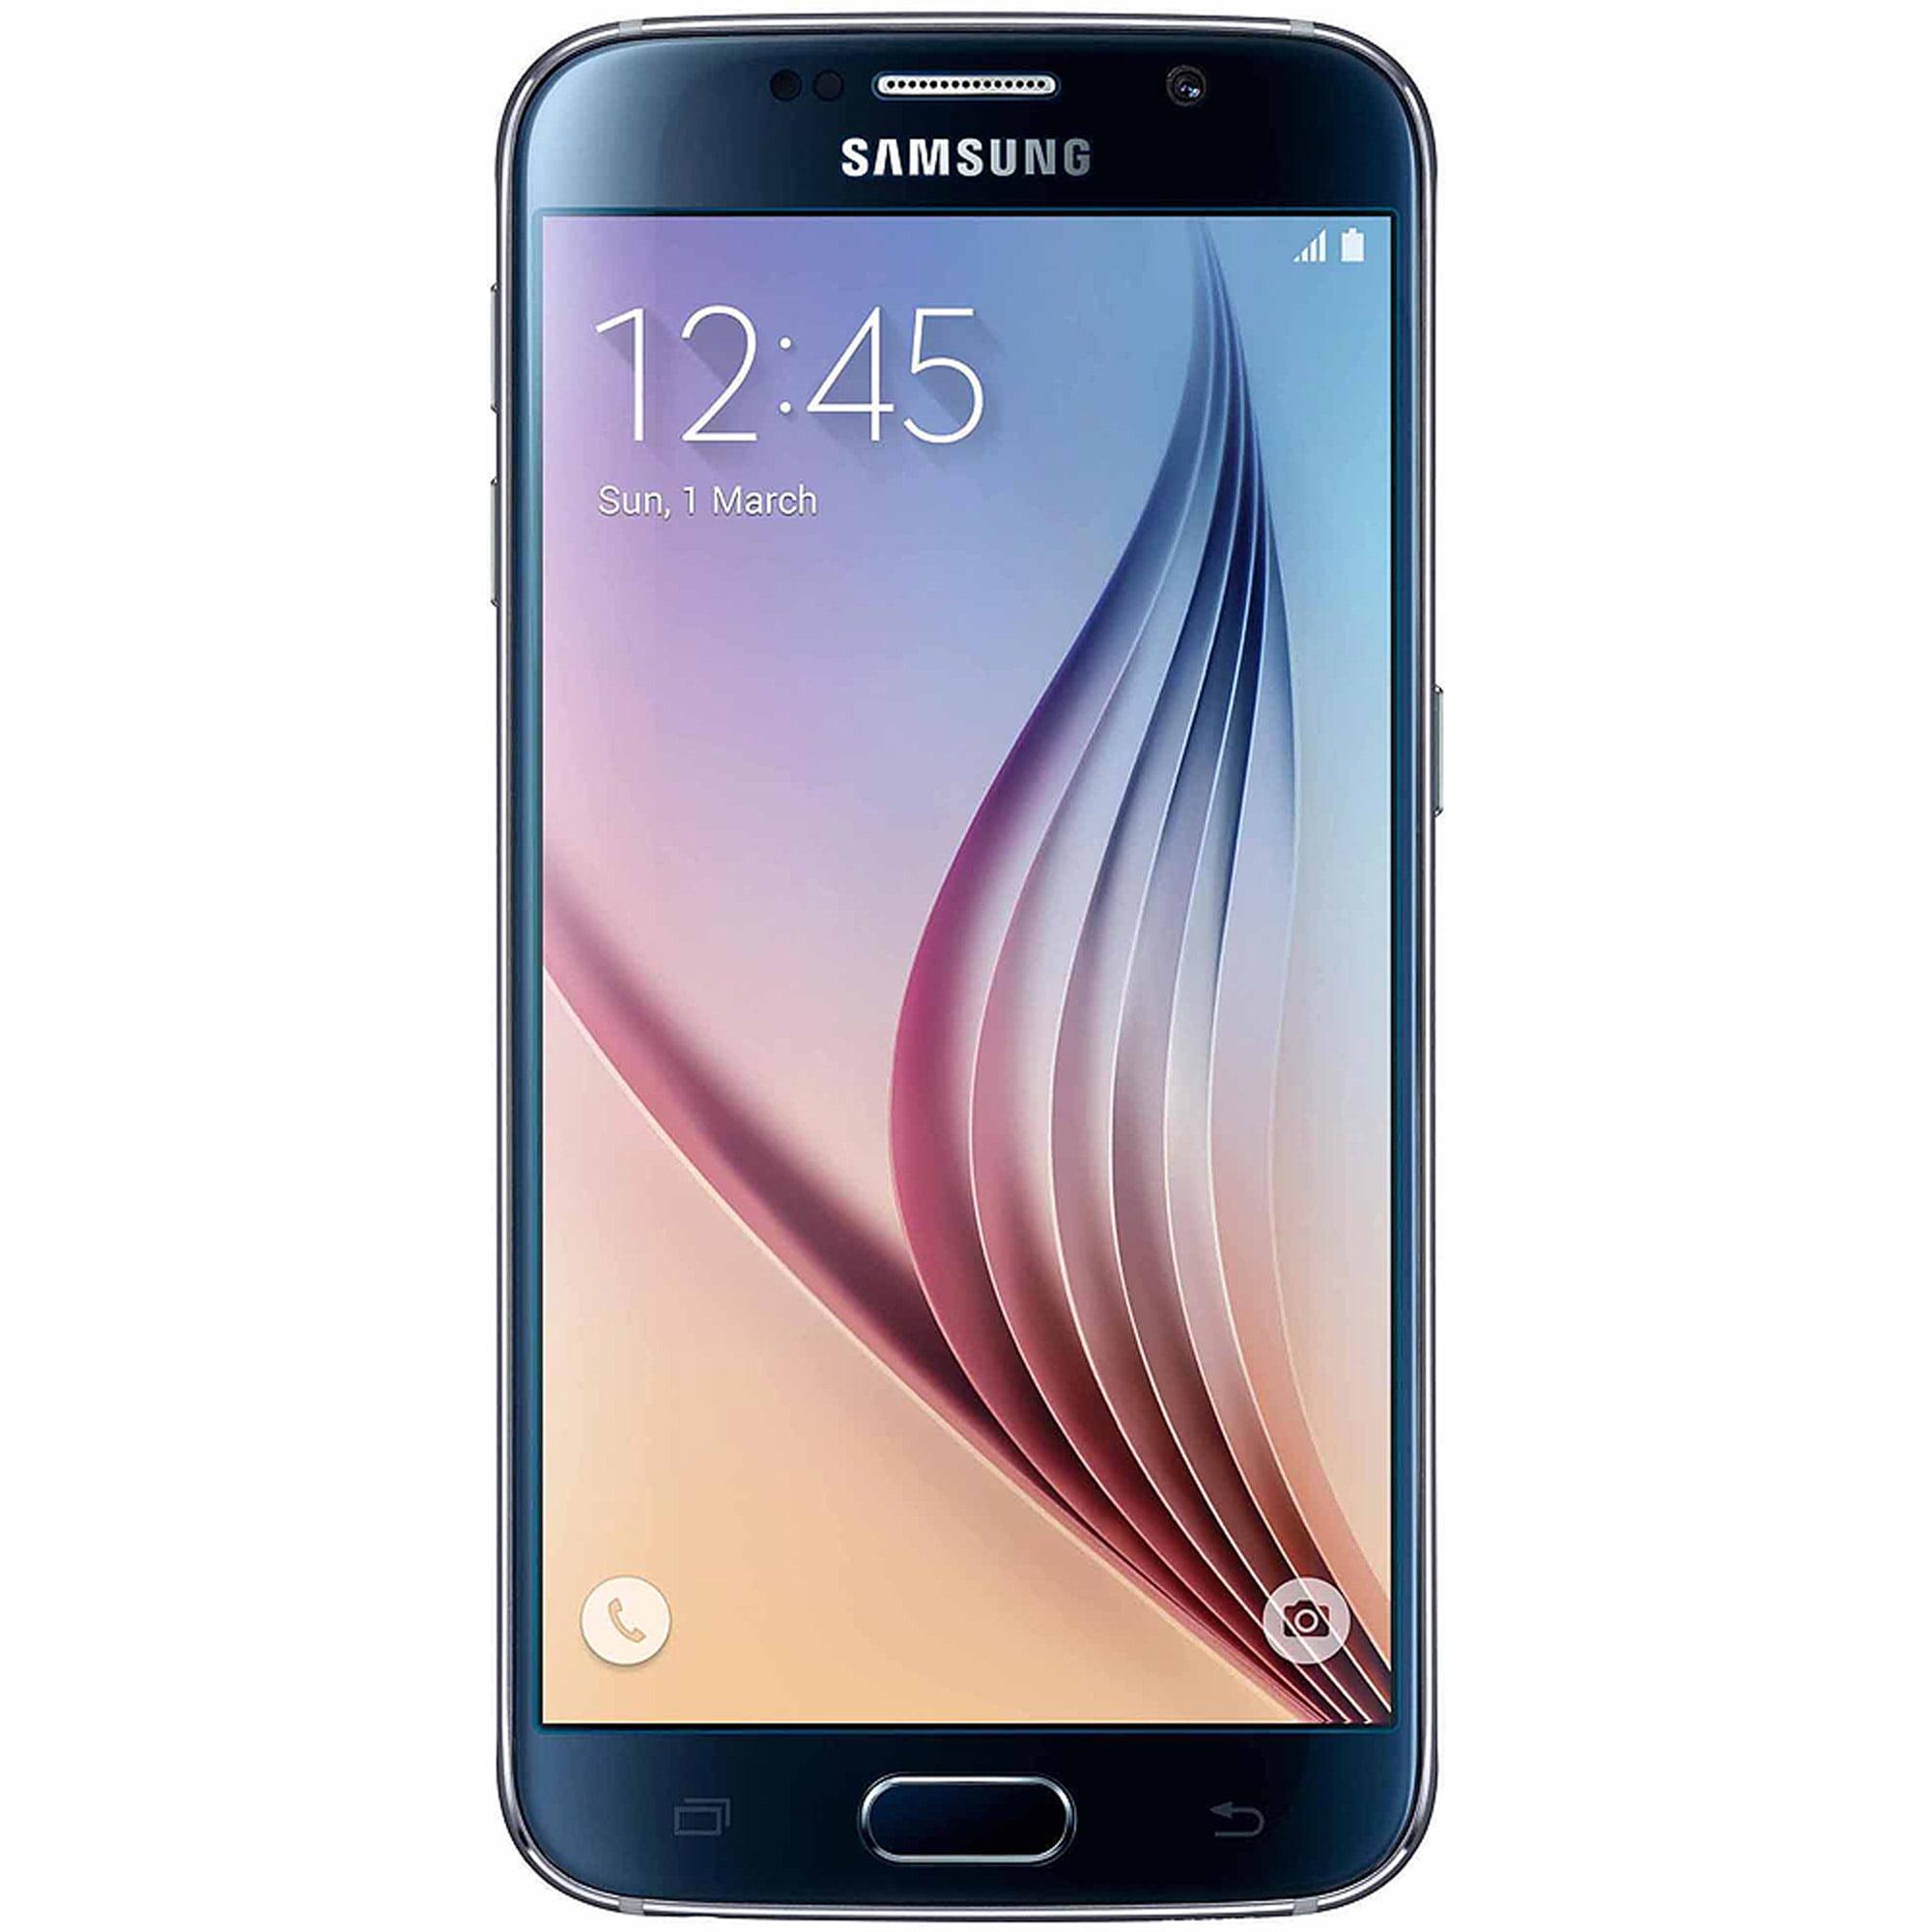 Samsung Galaxy S6 G920 64GB GSM 4G LTE Octa-Core Smartphone (Unlocked)